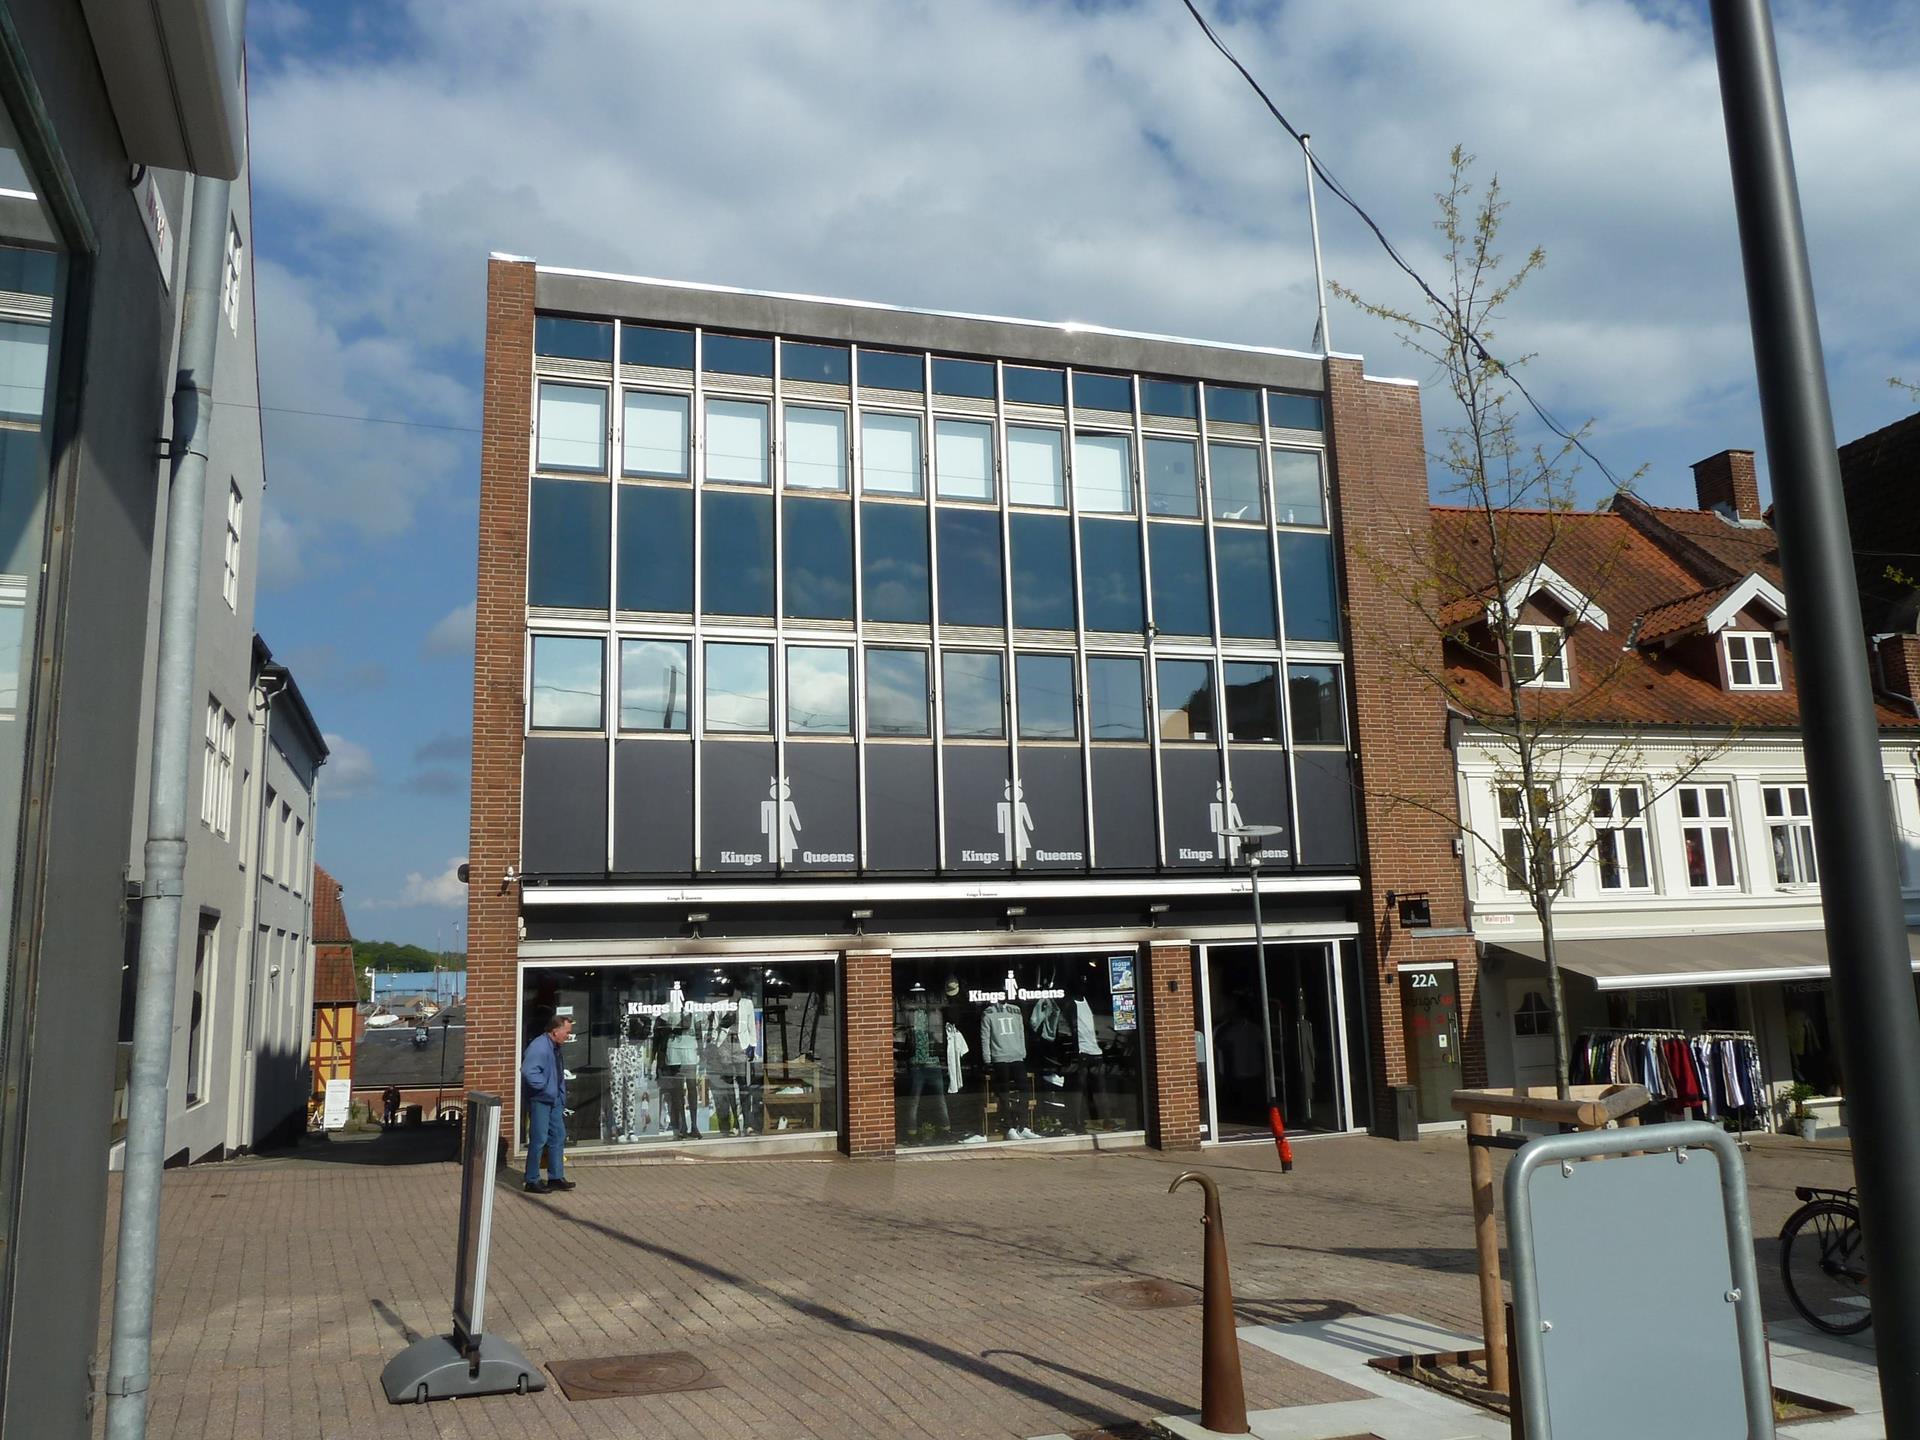 Bolig/erhverv på Møllergade i Svendborg - Andet